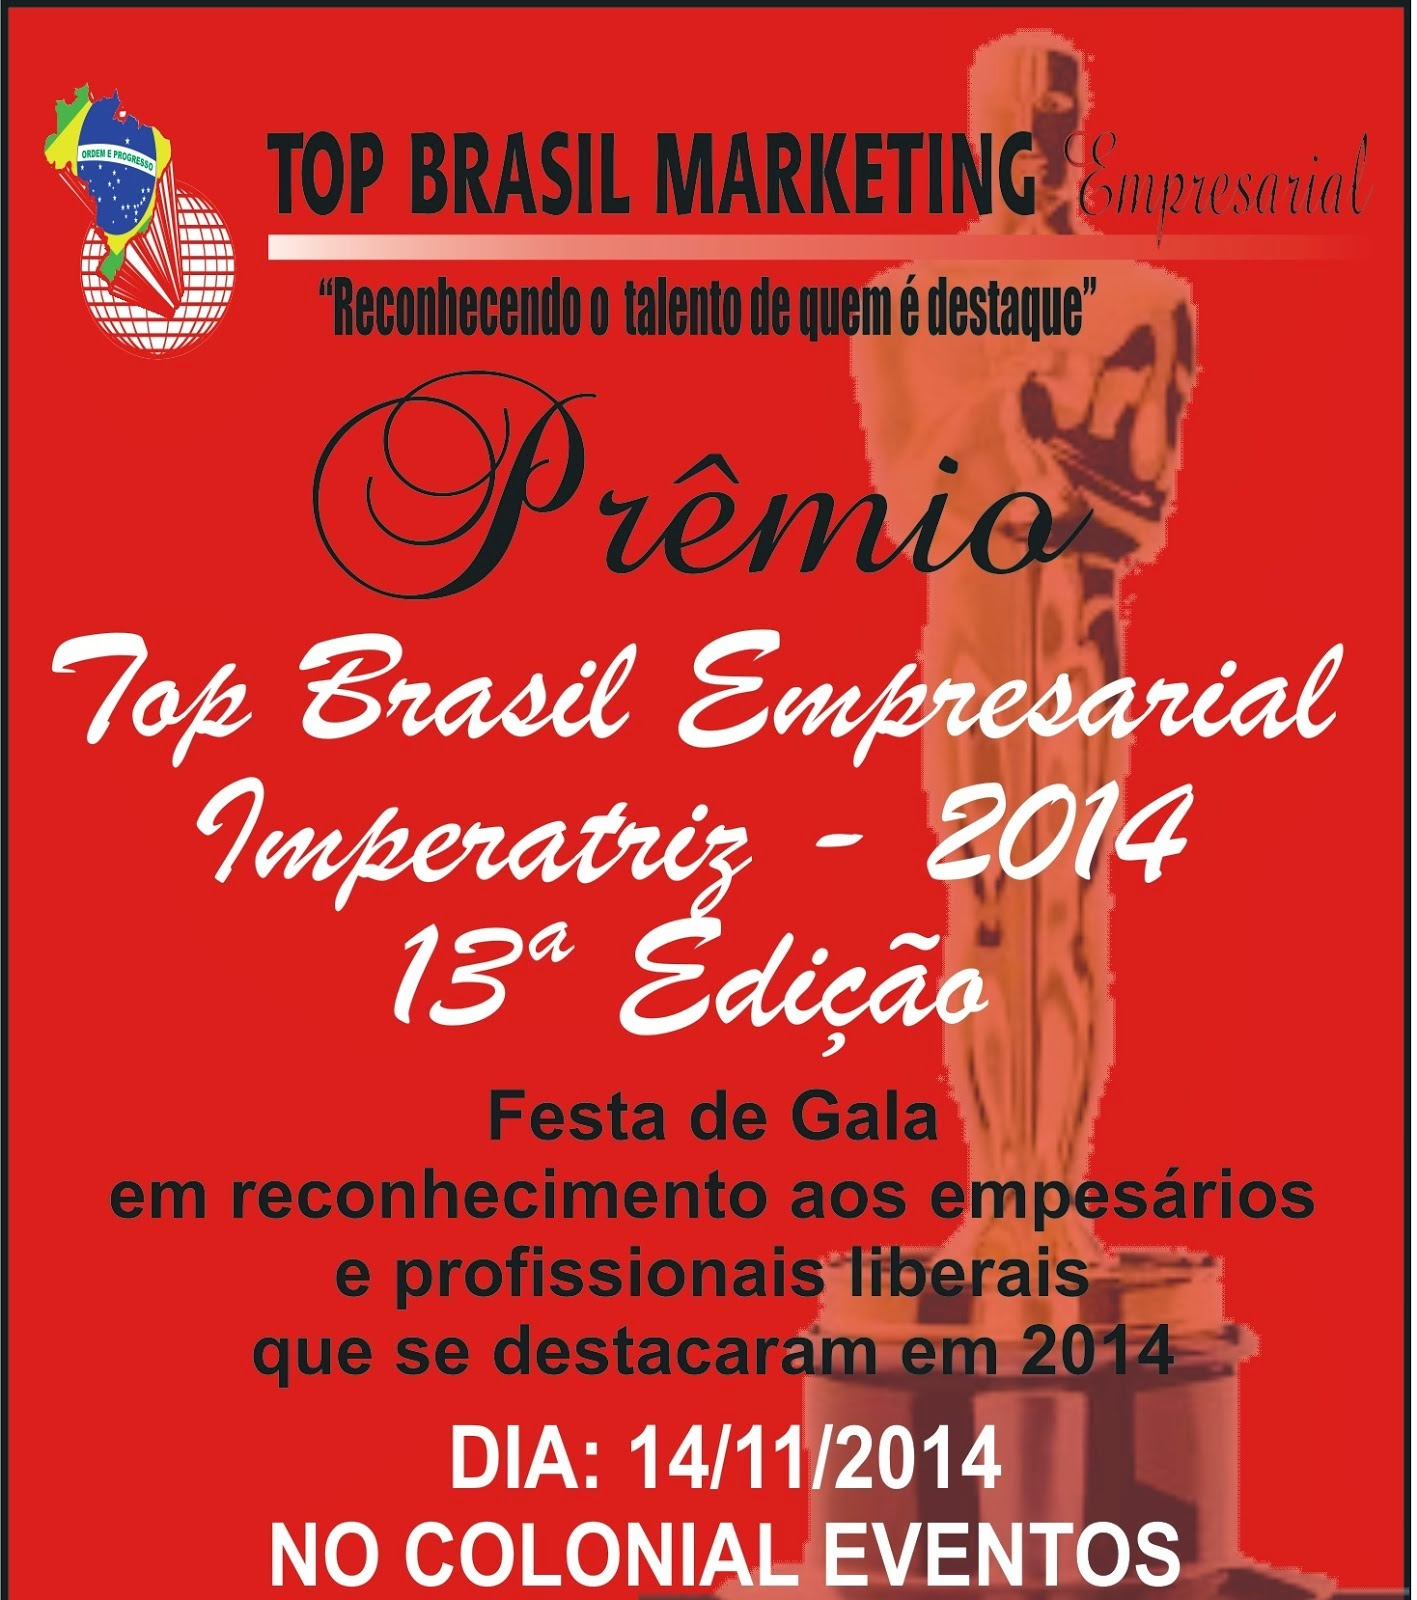 TOP BRASIL MARKETING EMPRESARIAL